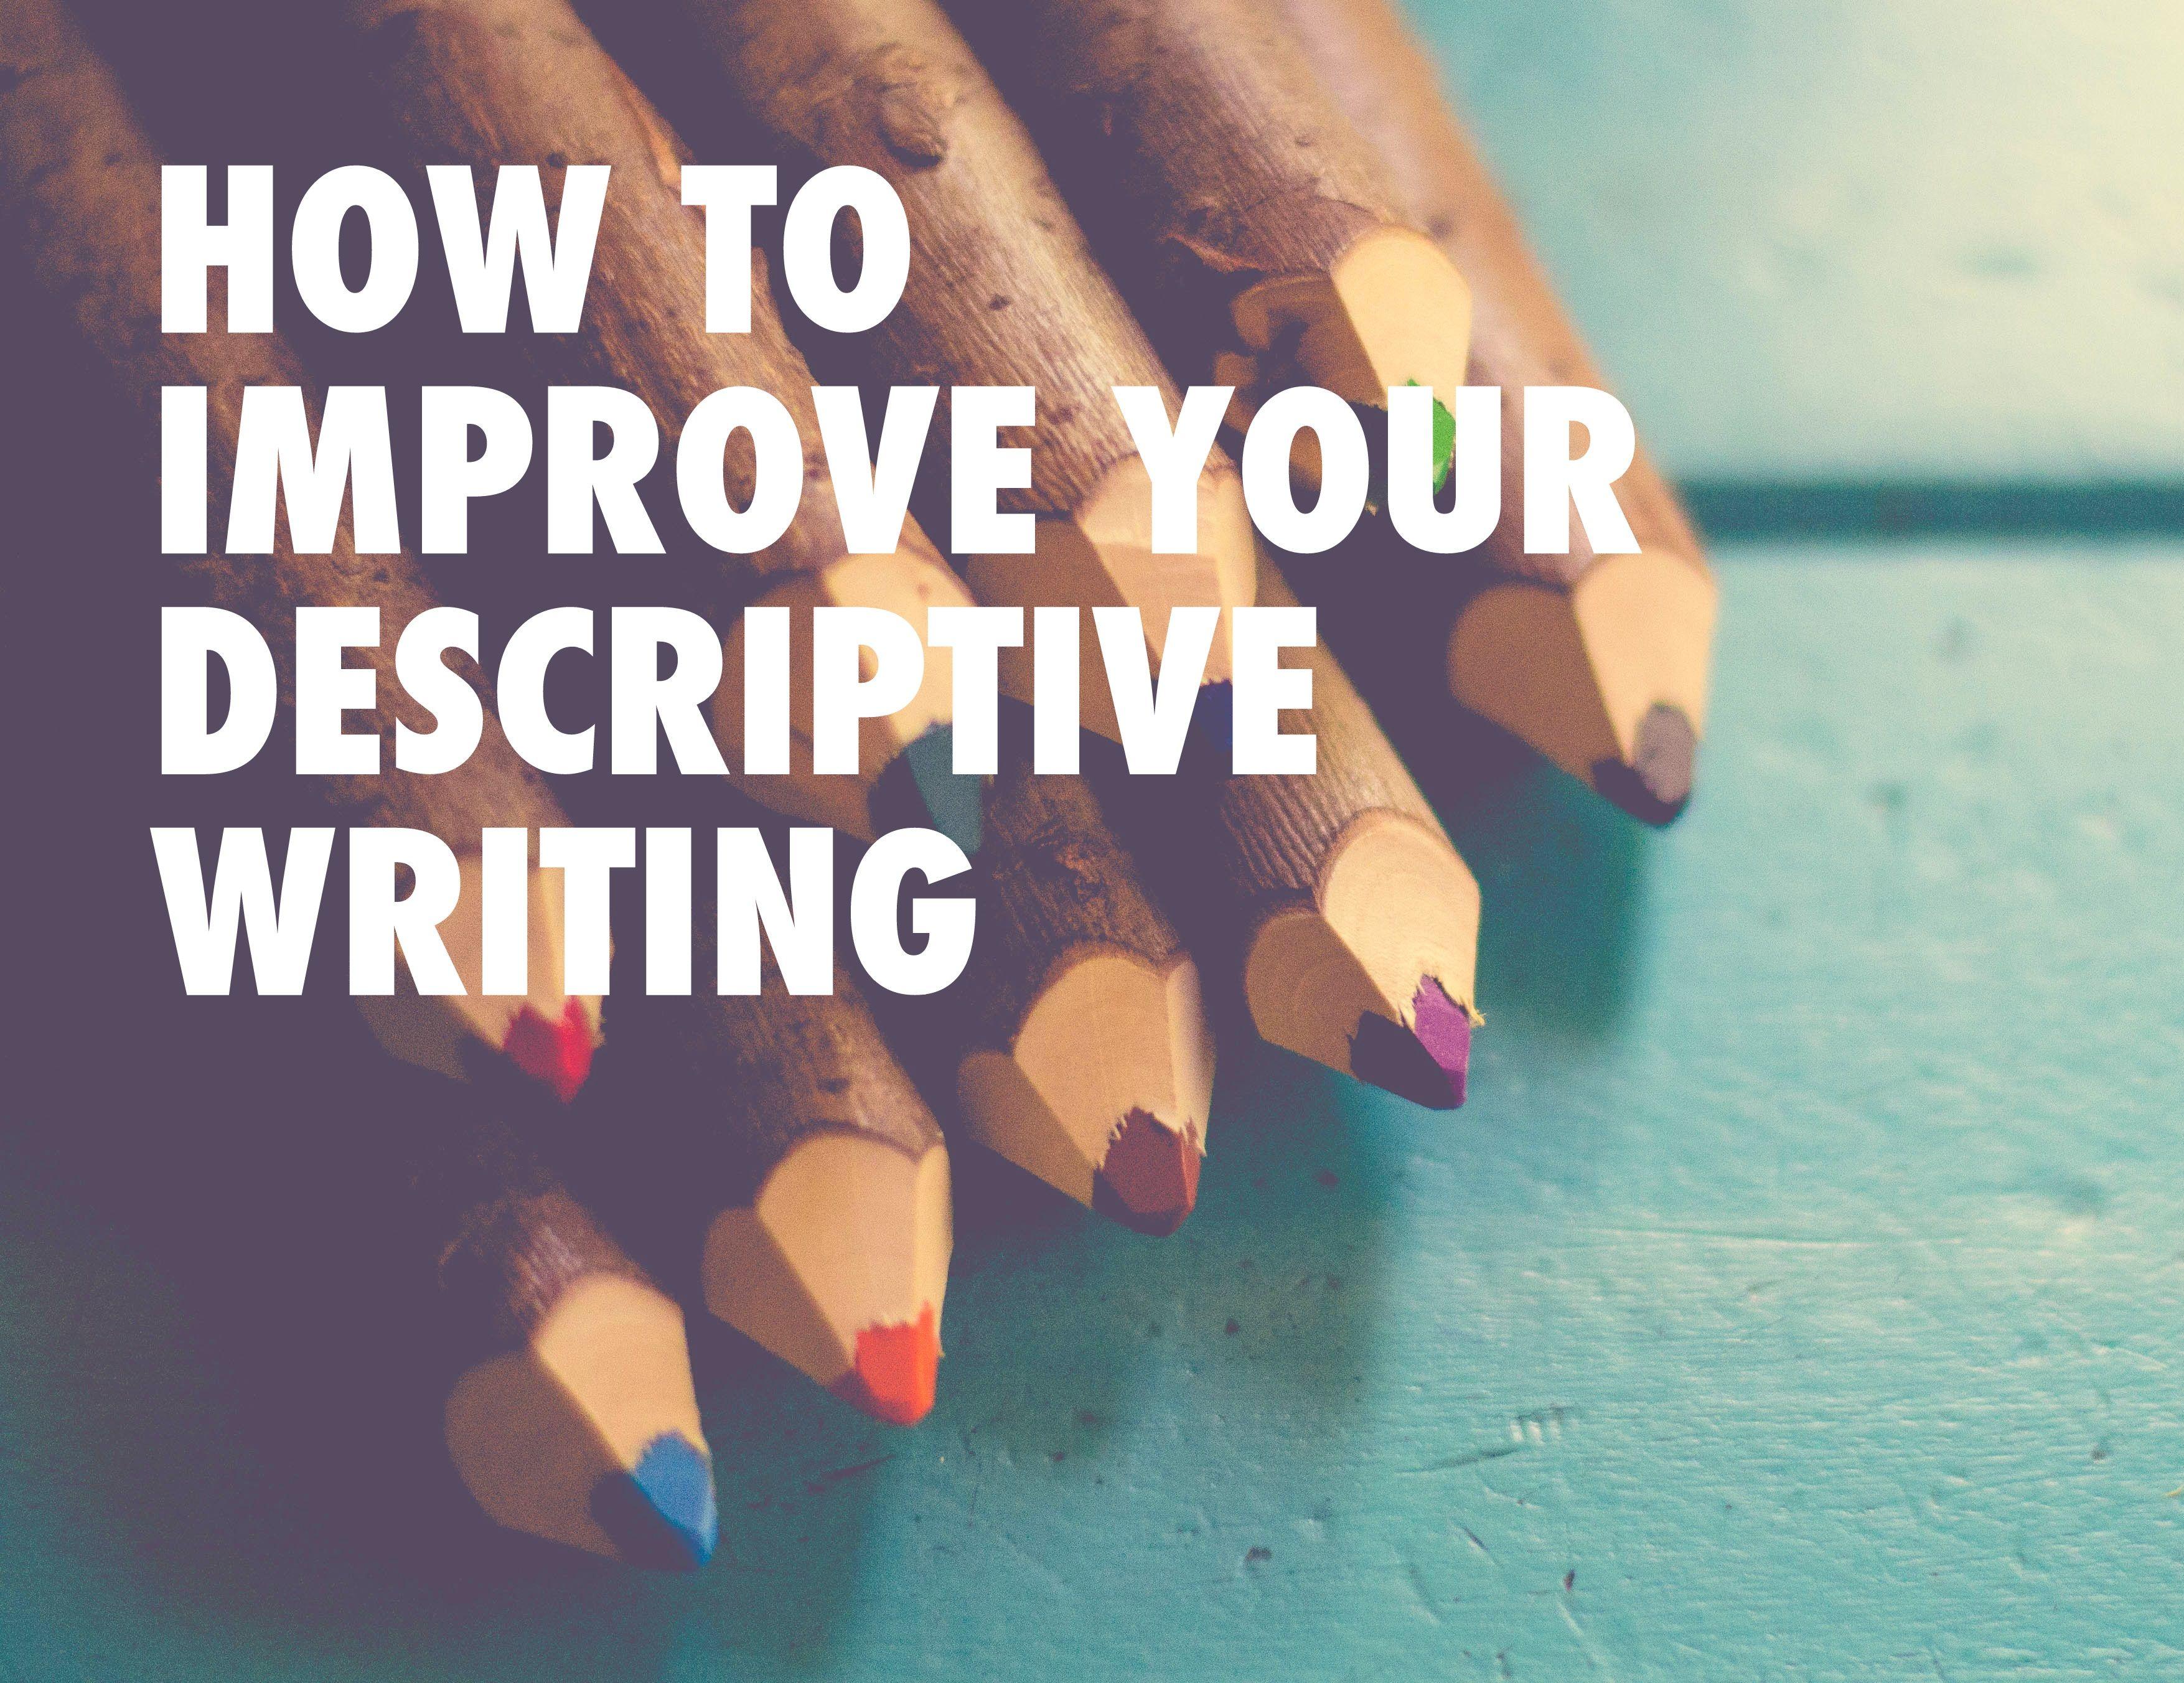 business of creative writing skills test